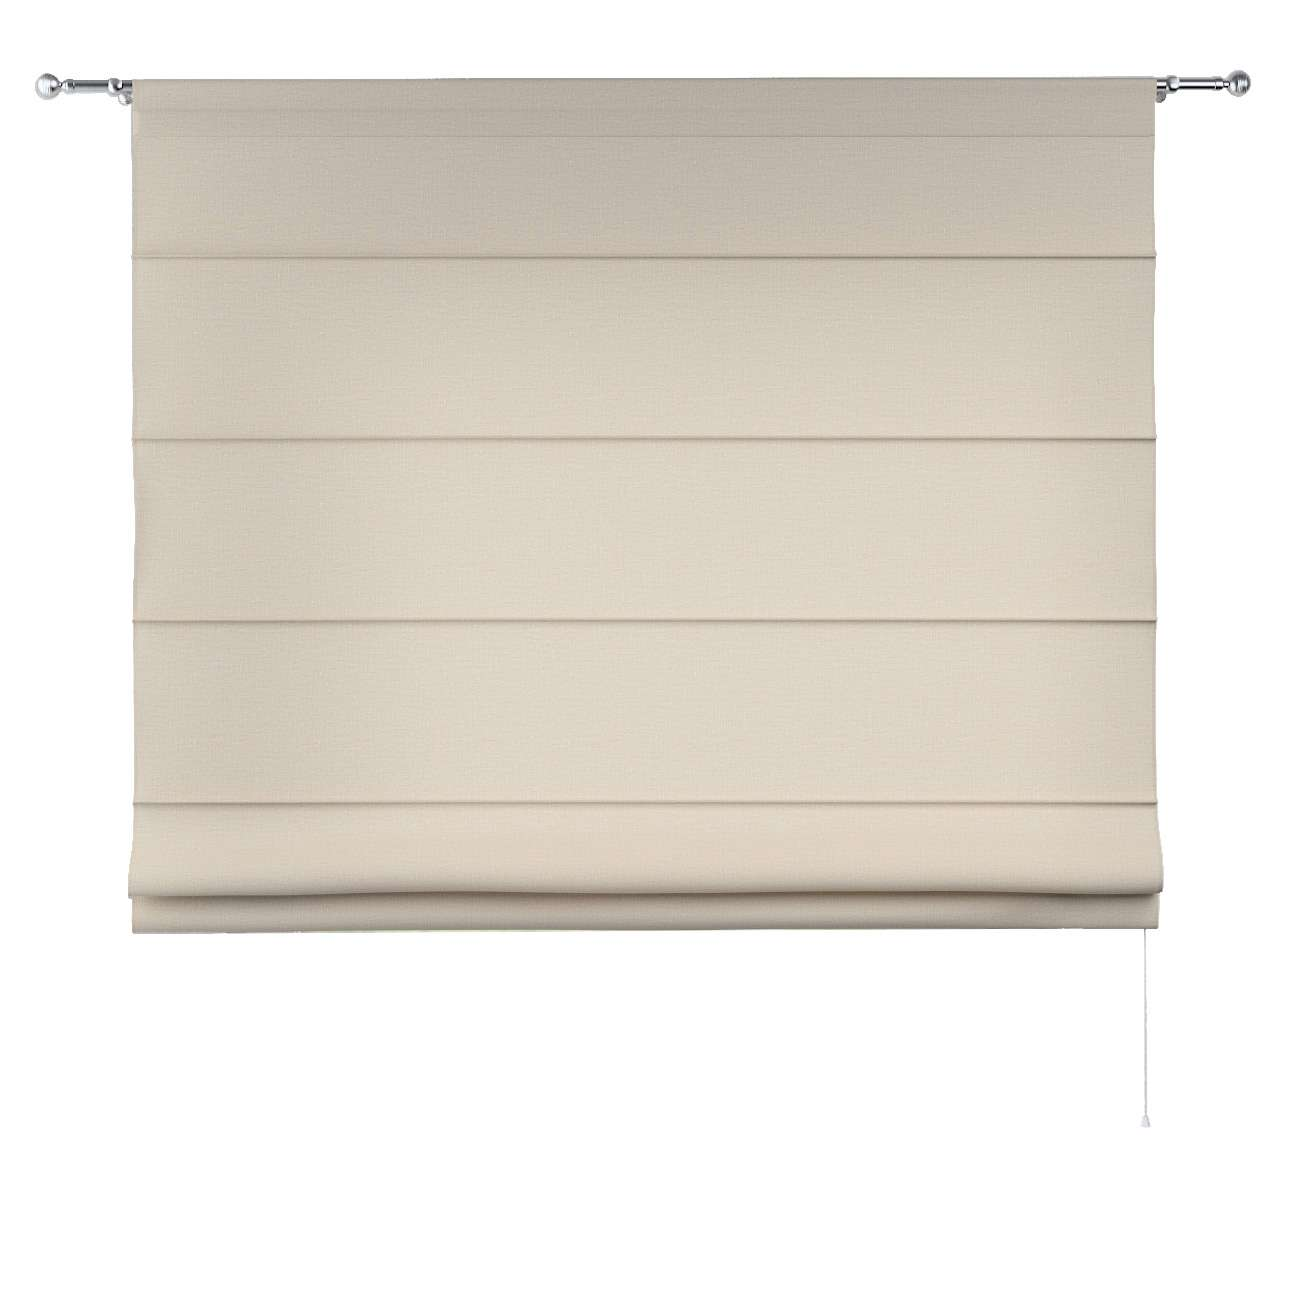 Roleta rzymska Torino w kolekcji Linen, tkanina: 392-05